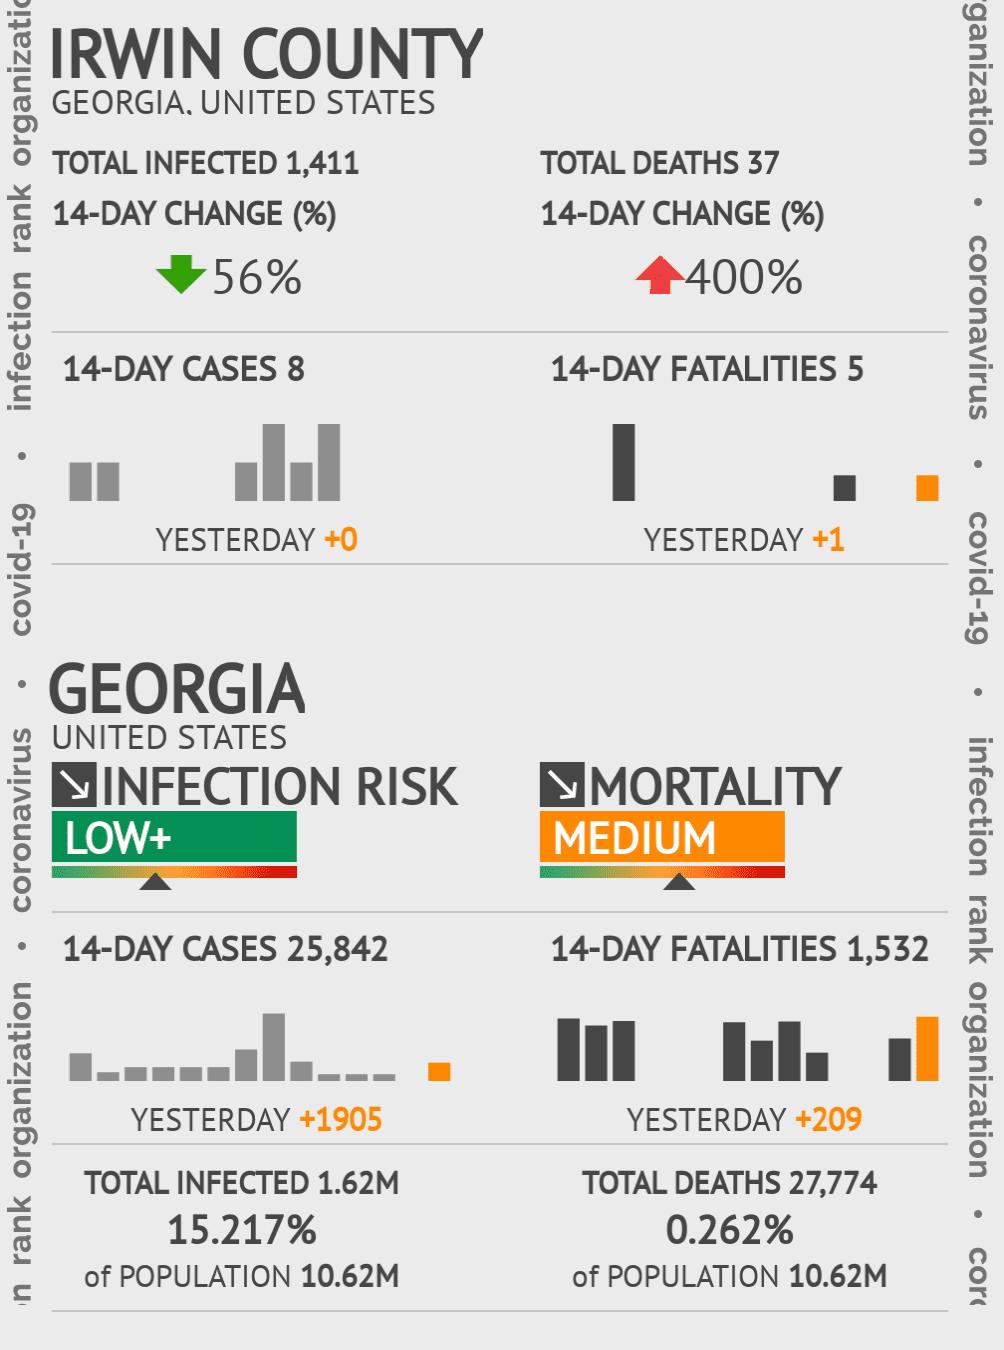 Irwin County Coronavirus Covid-19 Risk of Infection on November 27, 2020